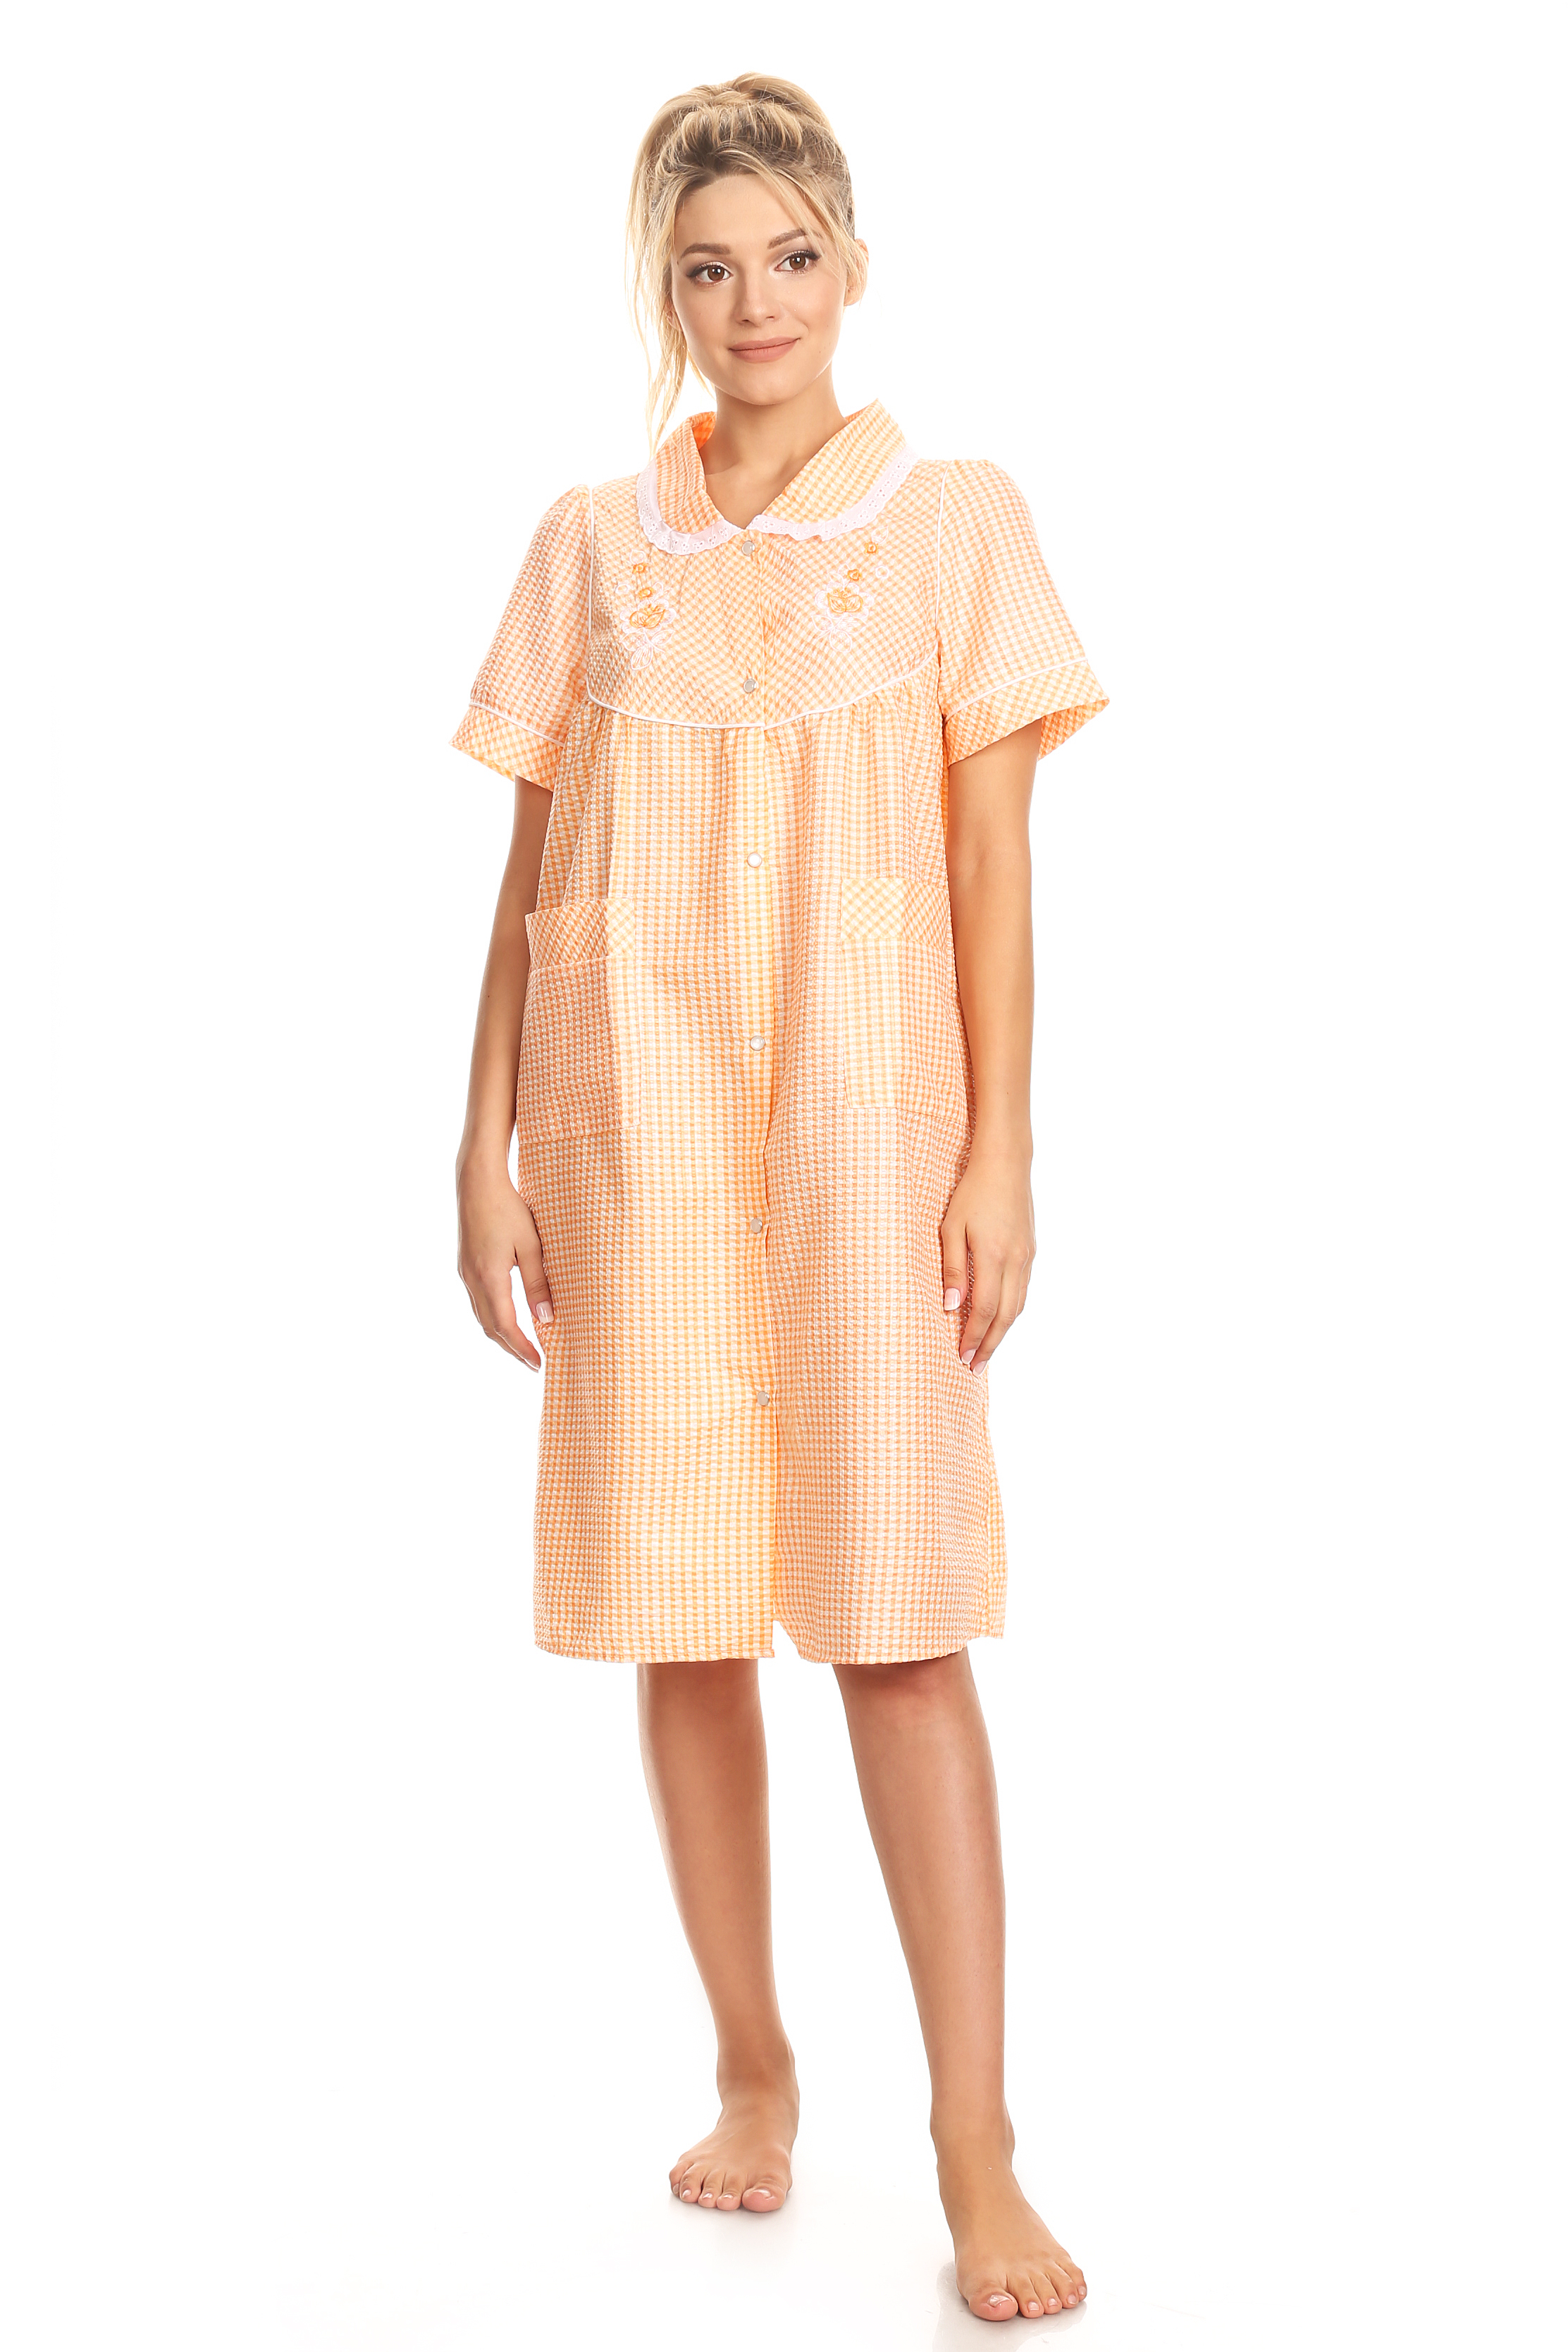 2010 Womens Nightgown Sleepwear Cotton Pajamas - Woman Sleeveless Sleep Dress Nightshirt Pink 2X